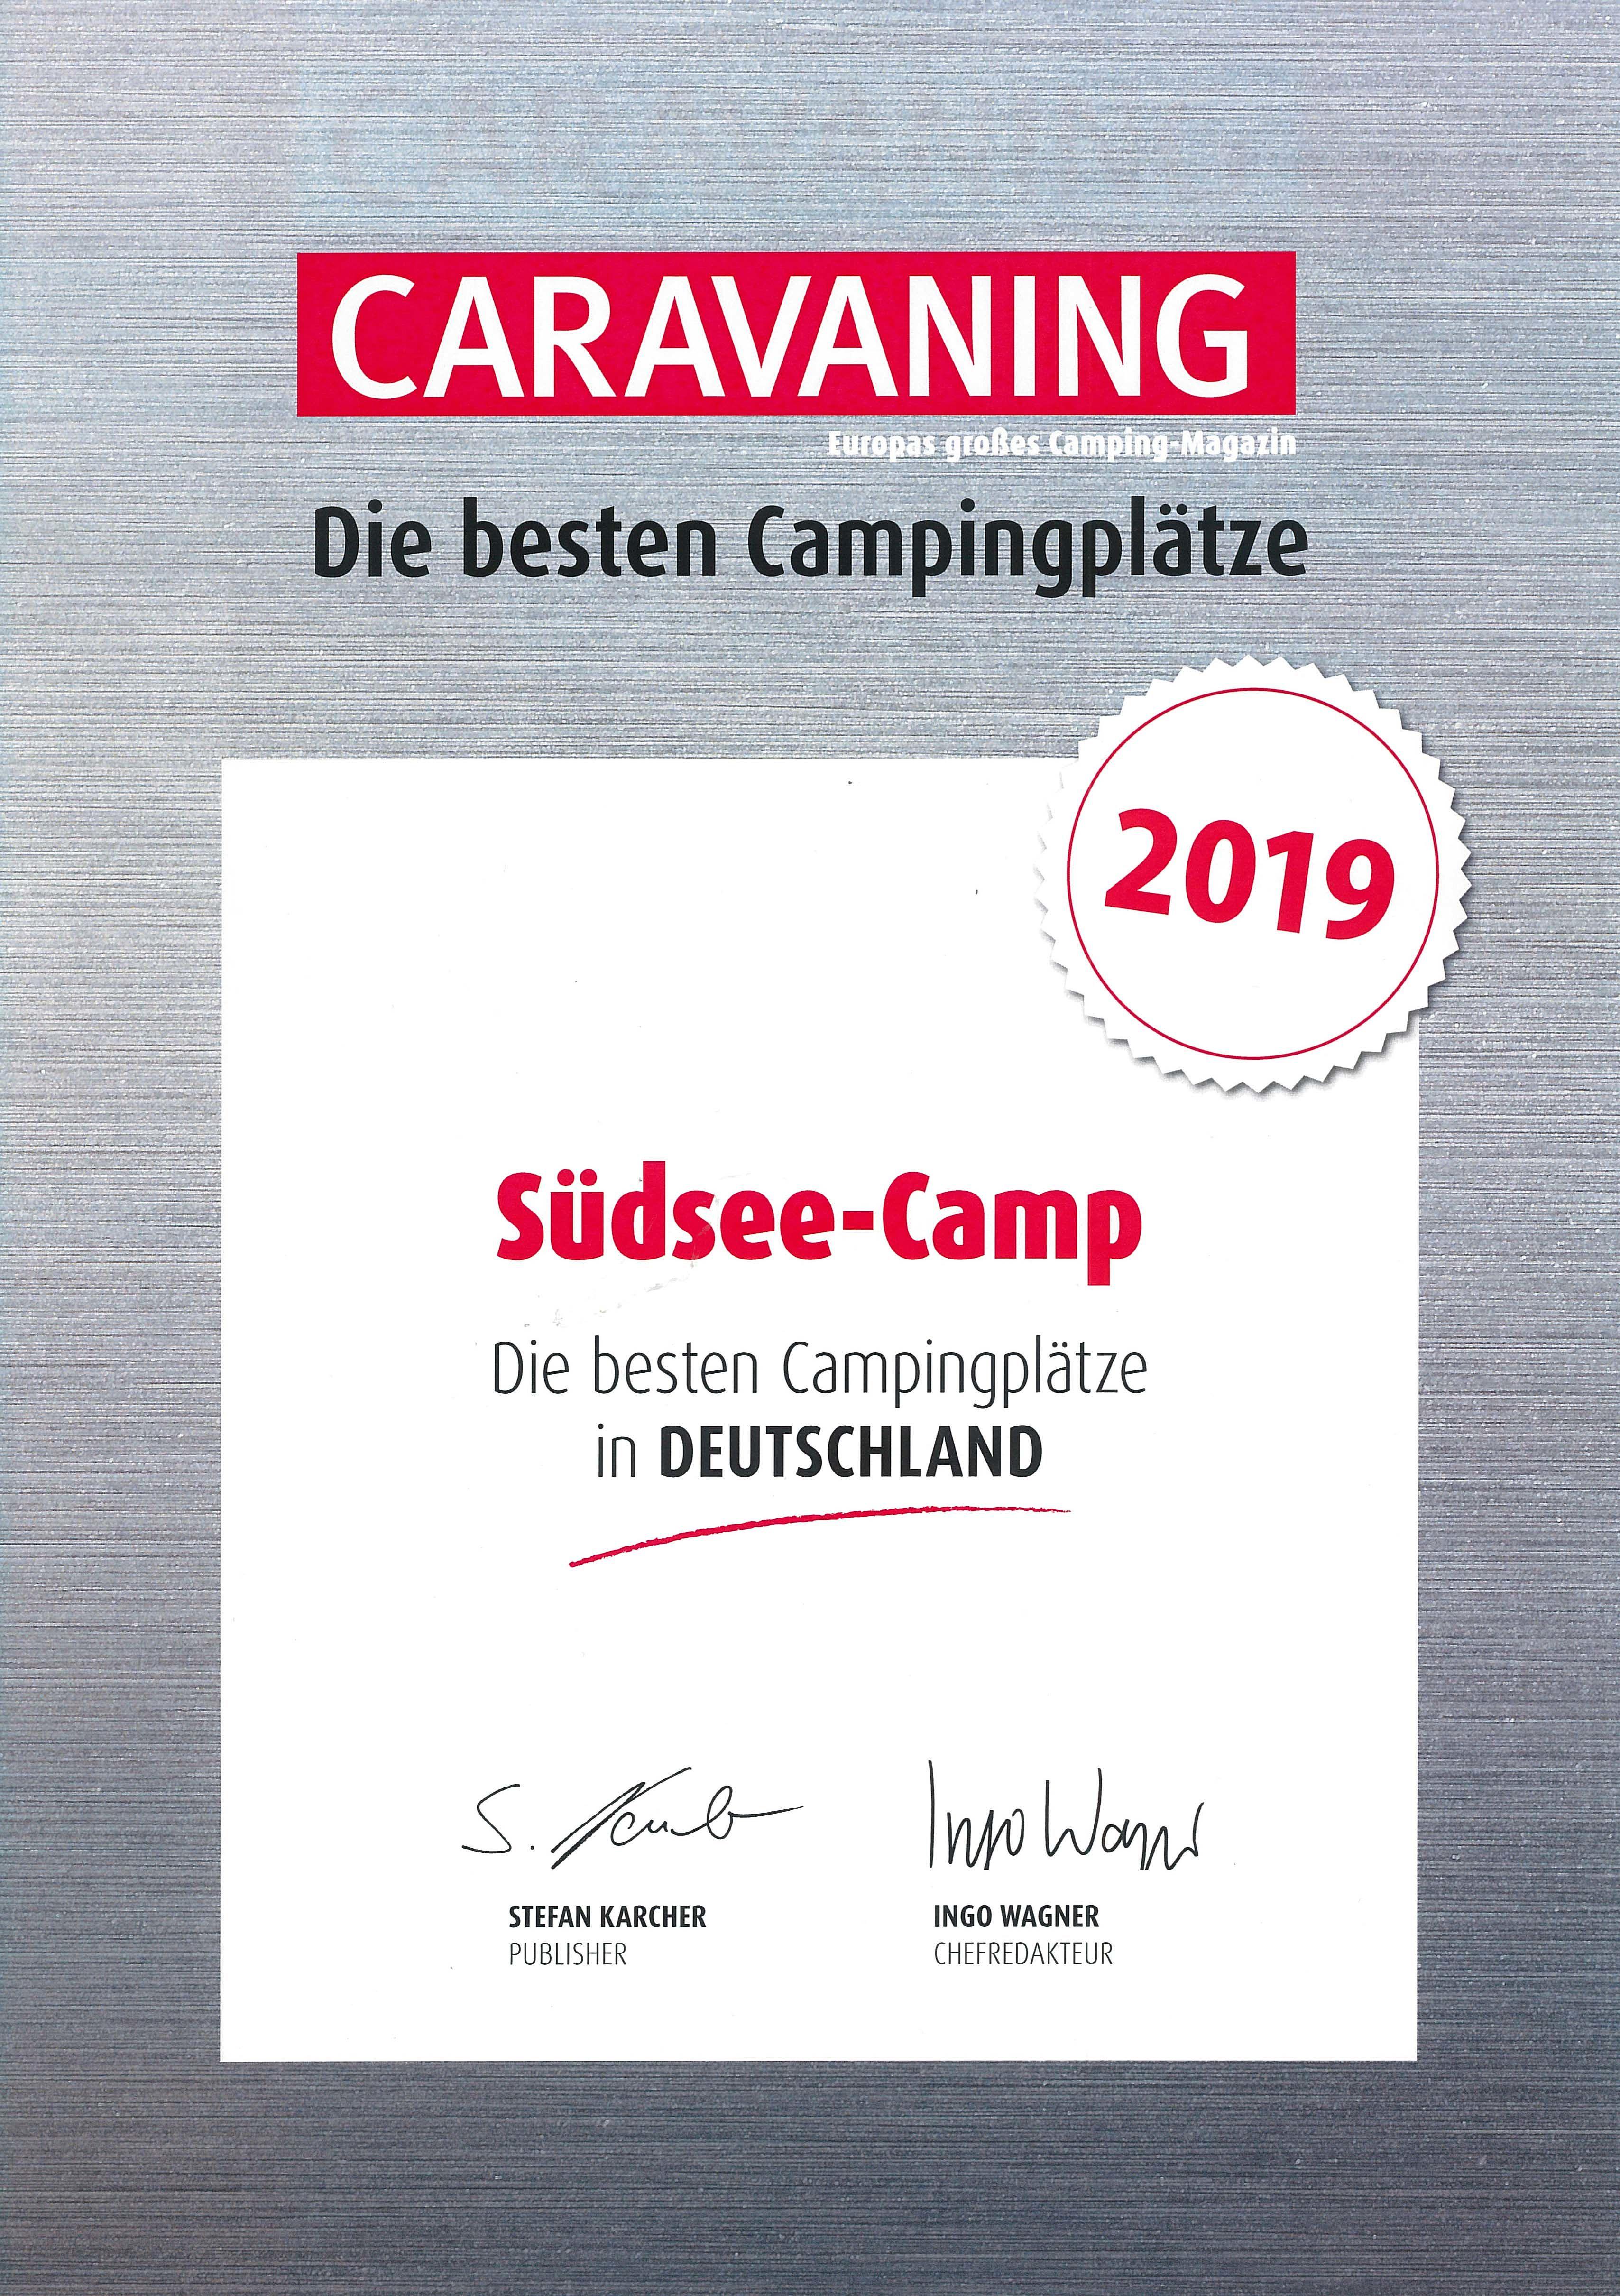 Caravaning 2019